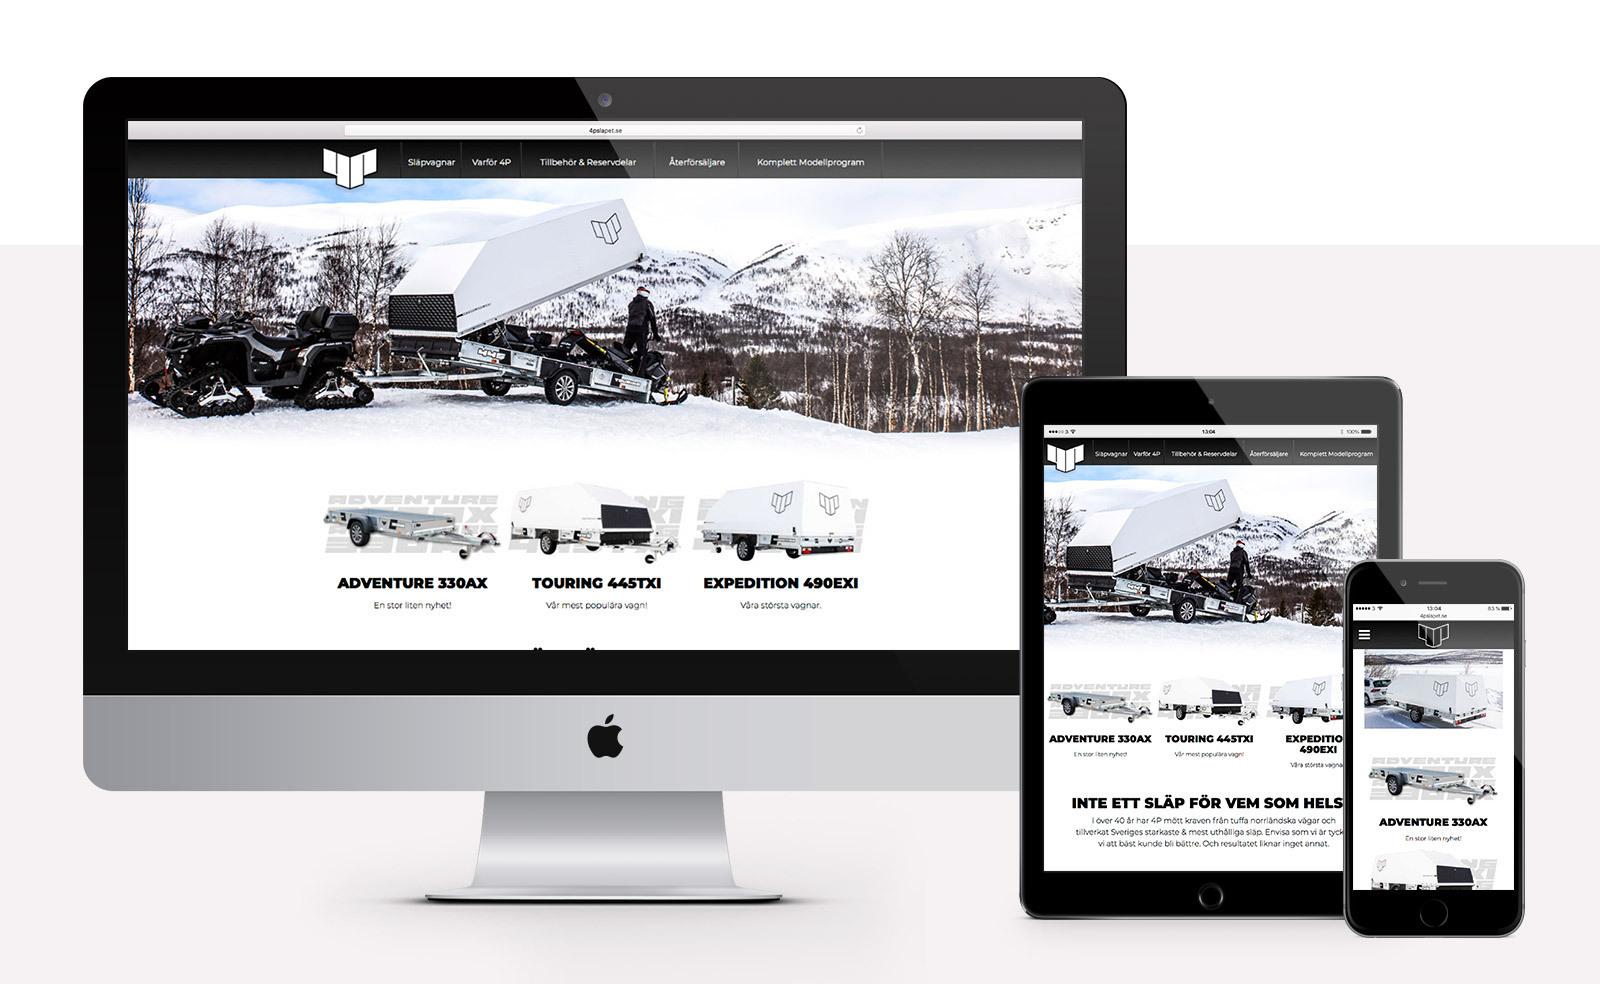 4P-släpet webbplats - Mac, iPad, iPhone